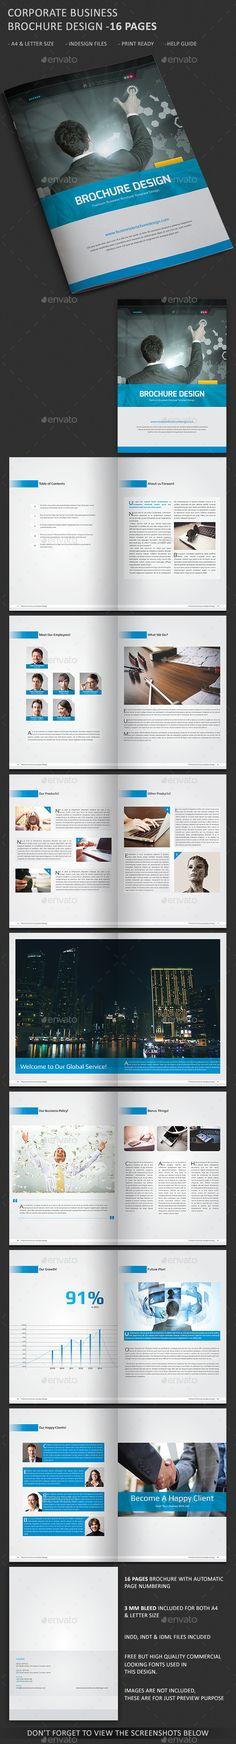 Corporate BiFold Brochures Template   Brochure Template